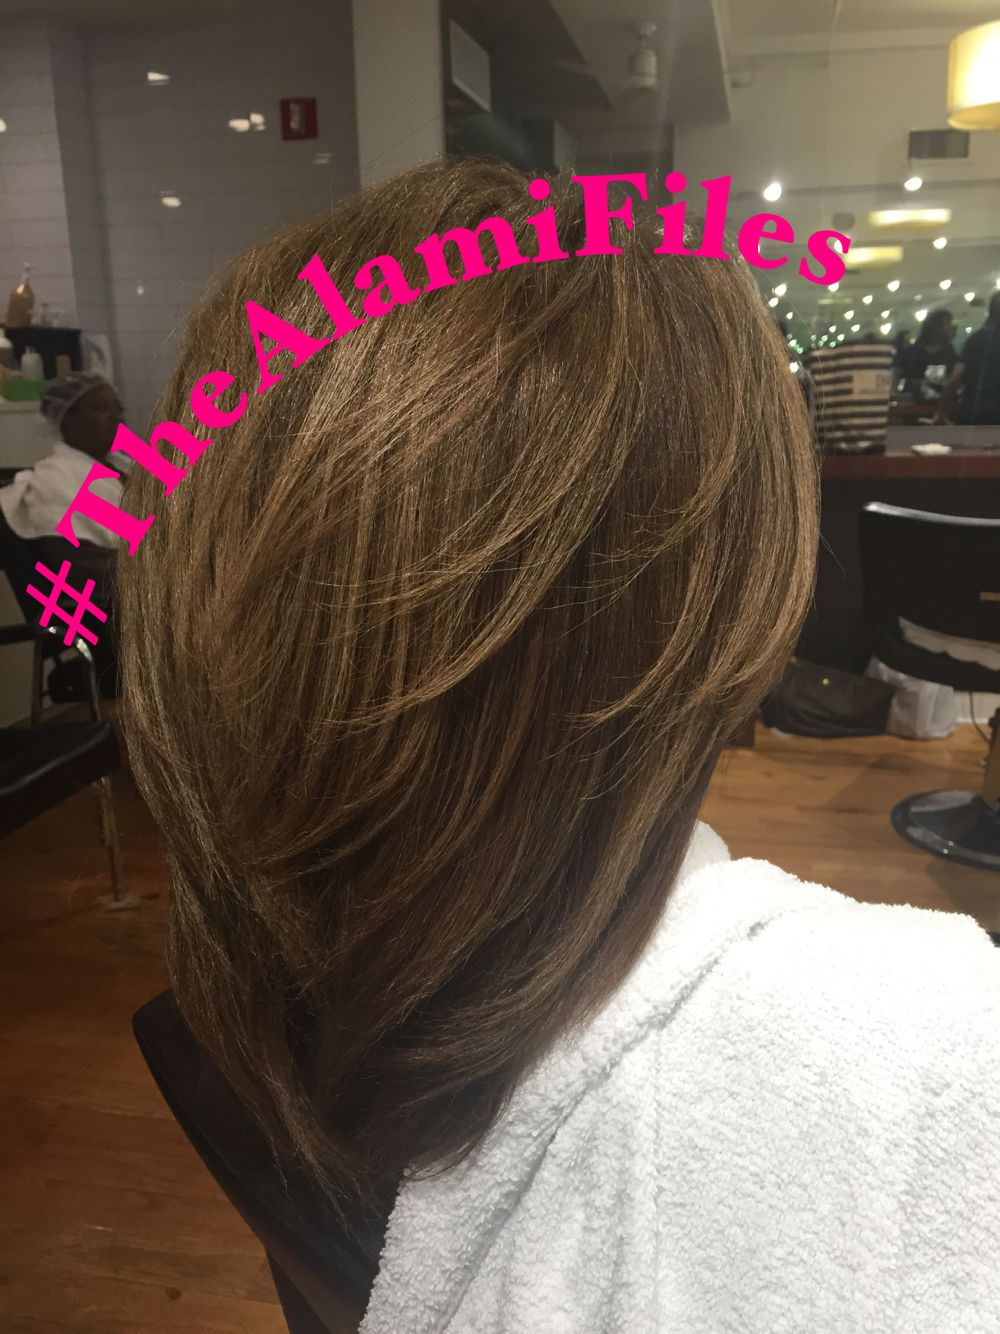 Silk Press on Natural Hair by Jamal Alami. www.StyleSeat